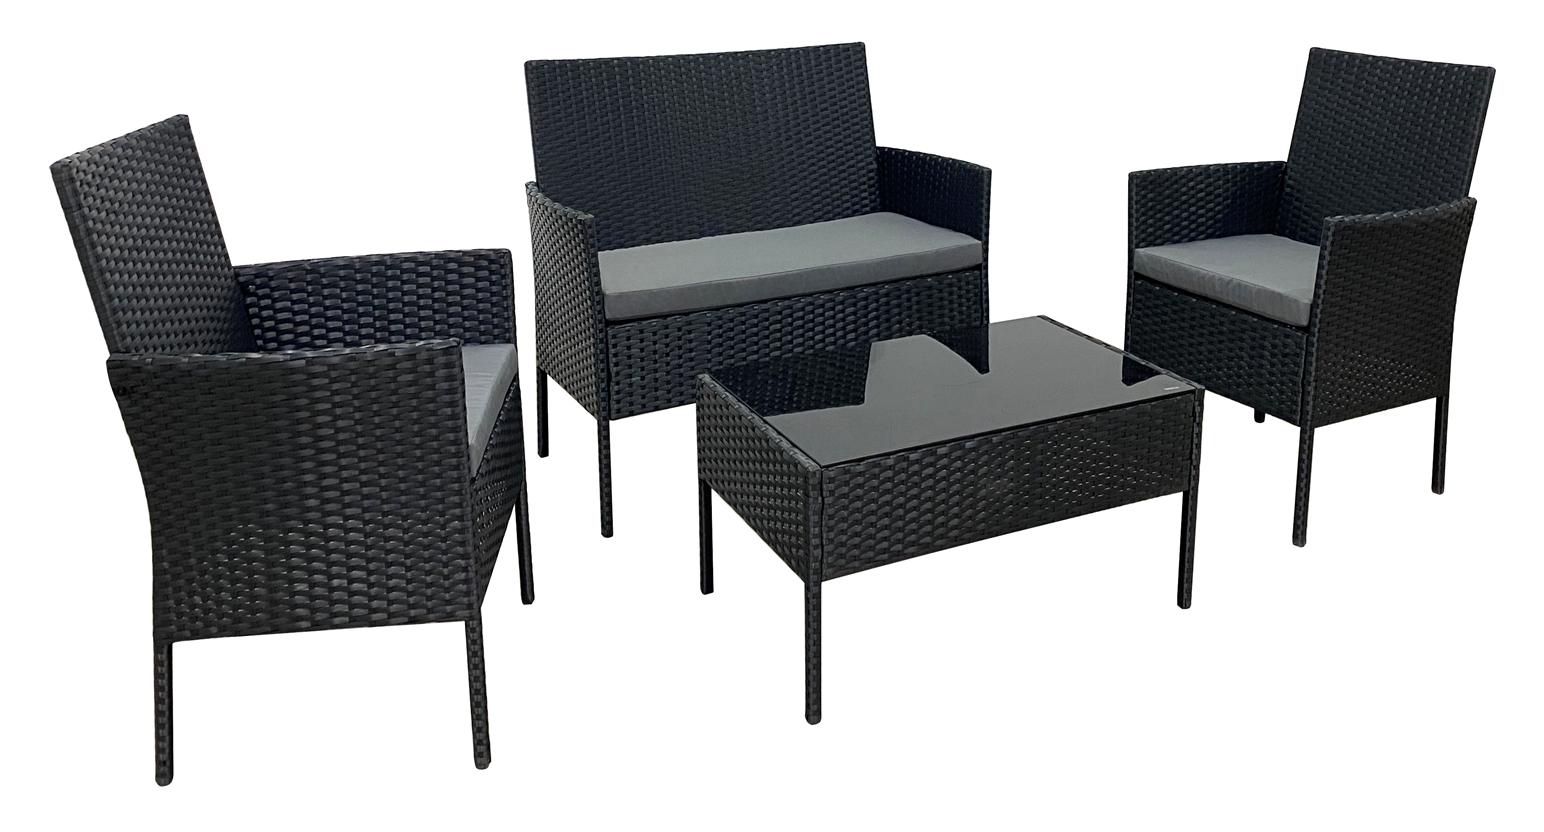 Garden Furniture - RATTAN GARDEN FURNITURE SET 4 PIECE CHAIRS SOFA TABLE OUTDOOR PATIO SET BLACK